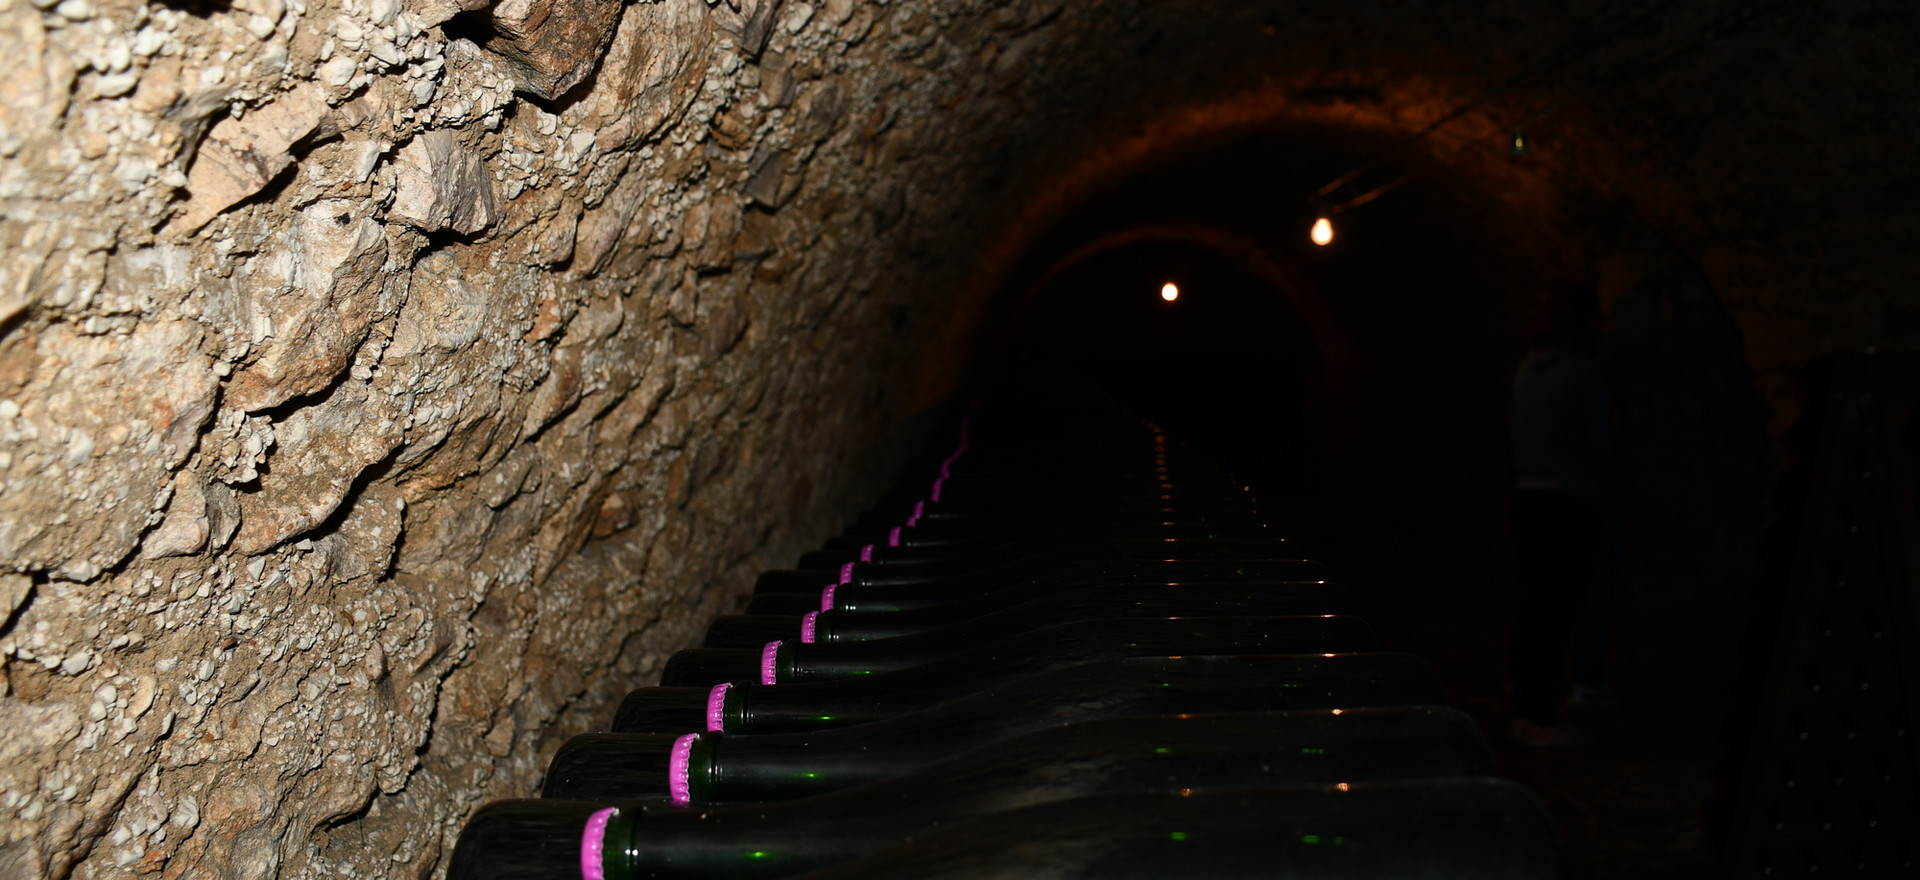 Im wundervollen Keller Labyrinth von Petit & Bajan.